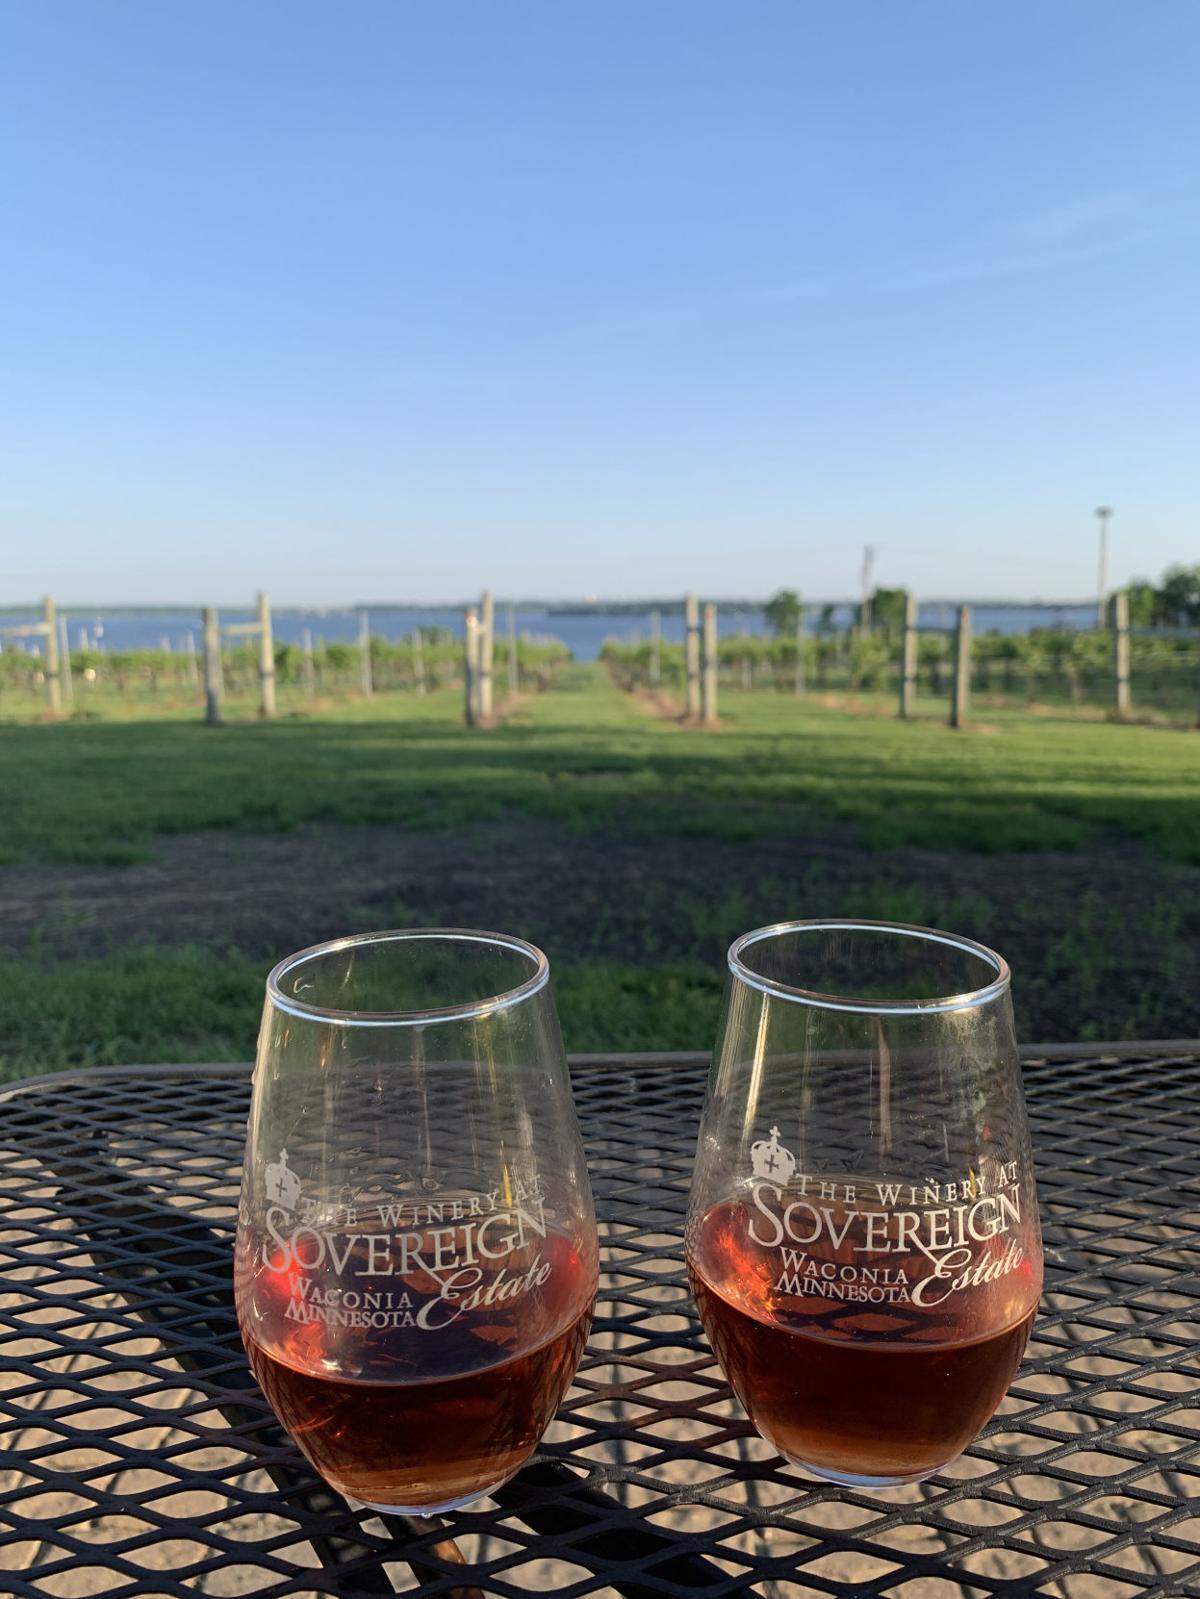 Sovereign Estate winery waconia